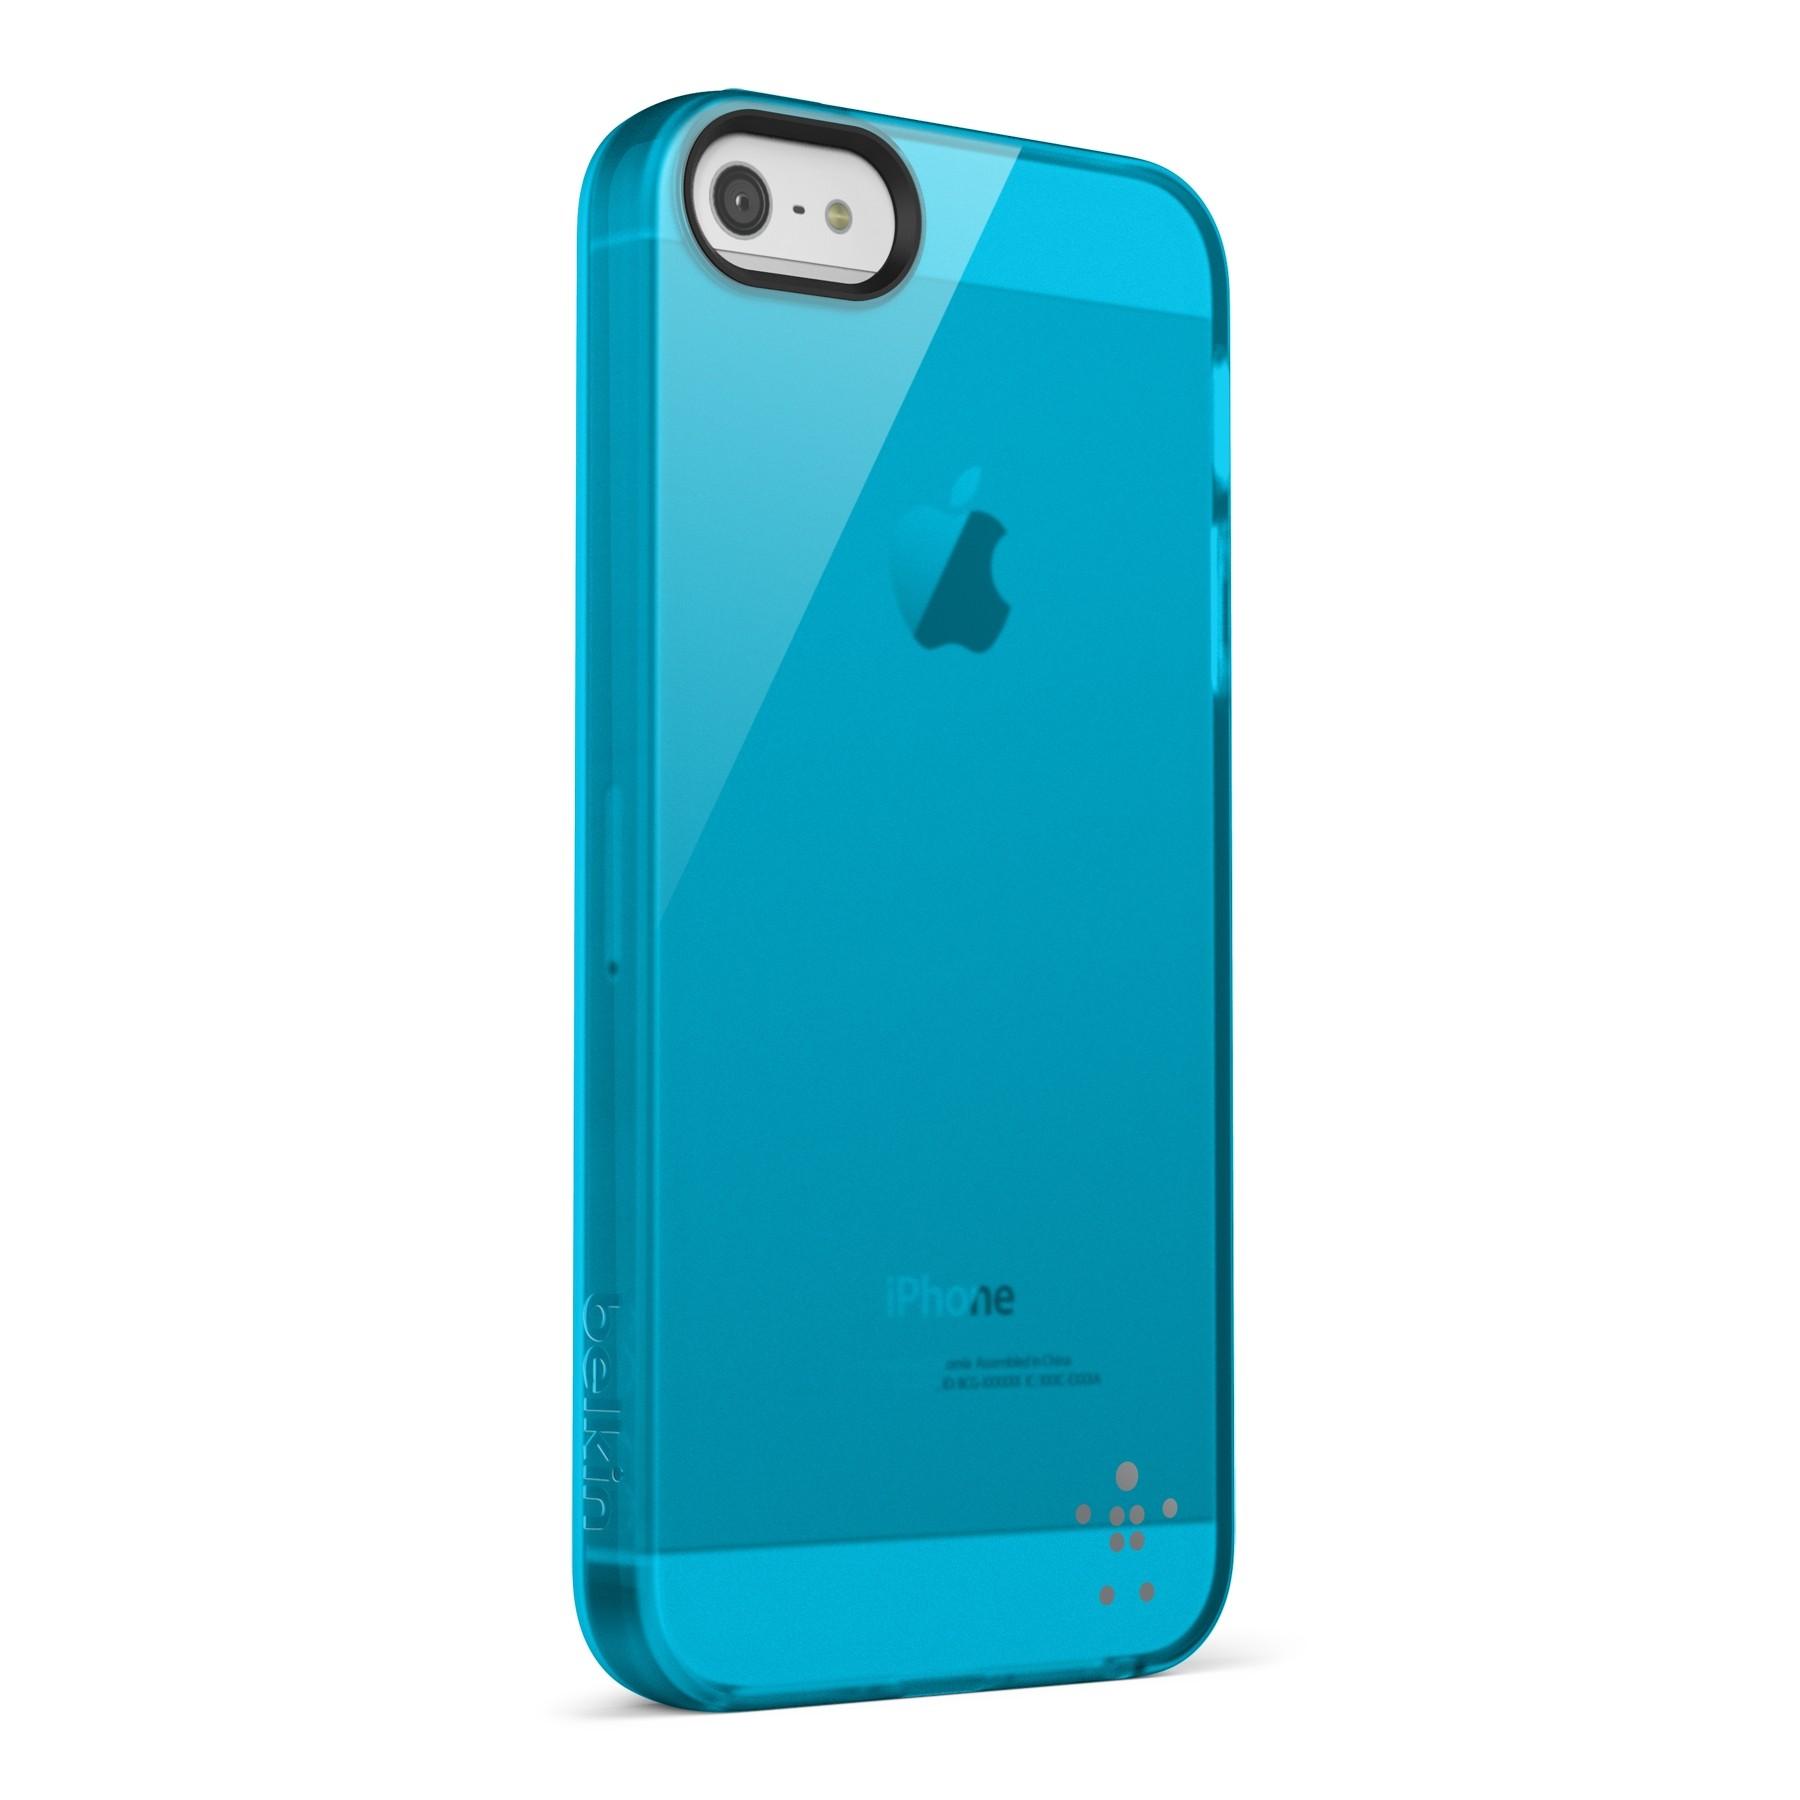 Belkin Grip Sheer Blacktop Case til iPhone 5 - Blå